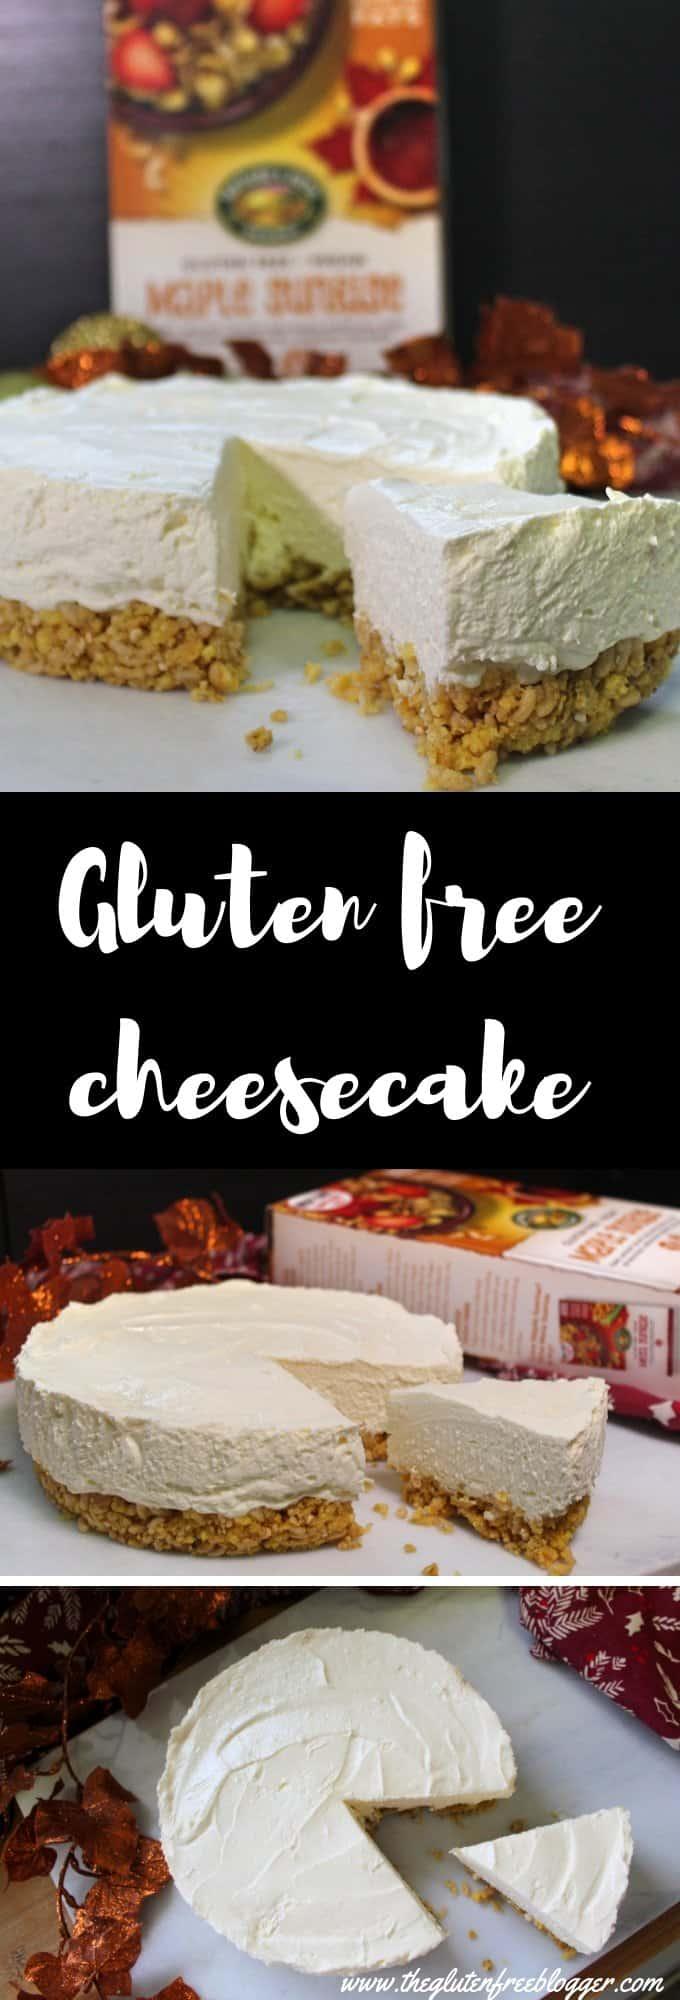 gluten free cheesecake recipe - maple cheesecake - christmas food - christmas cheesecake